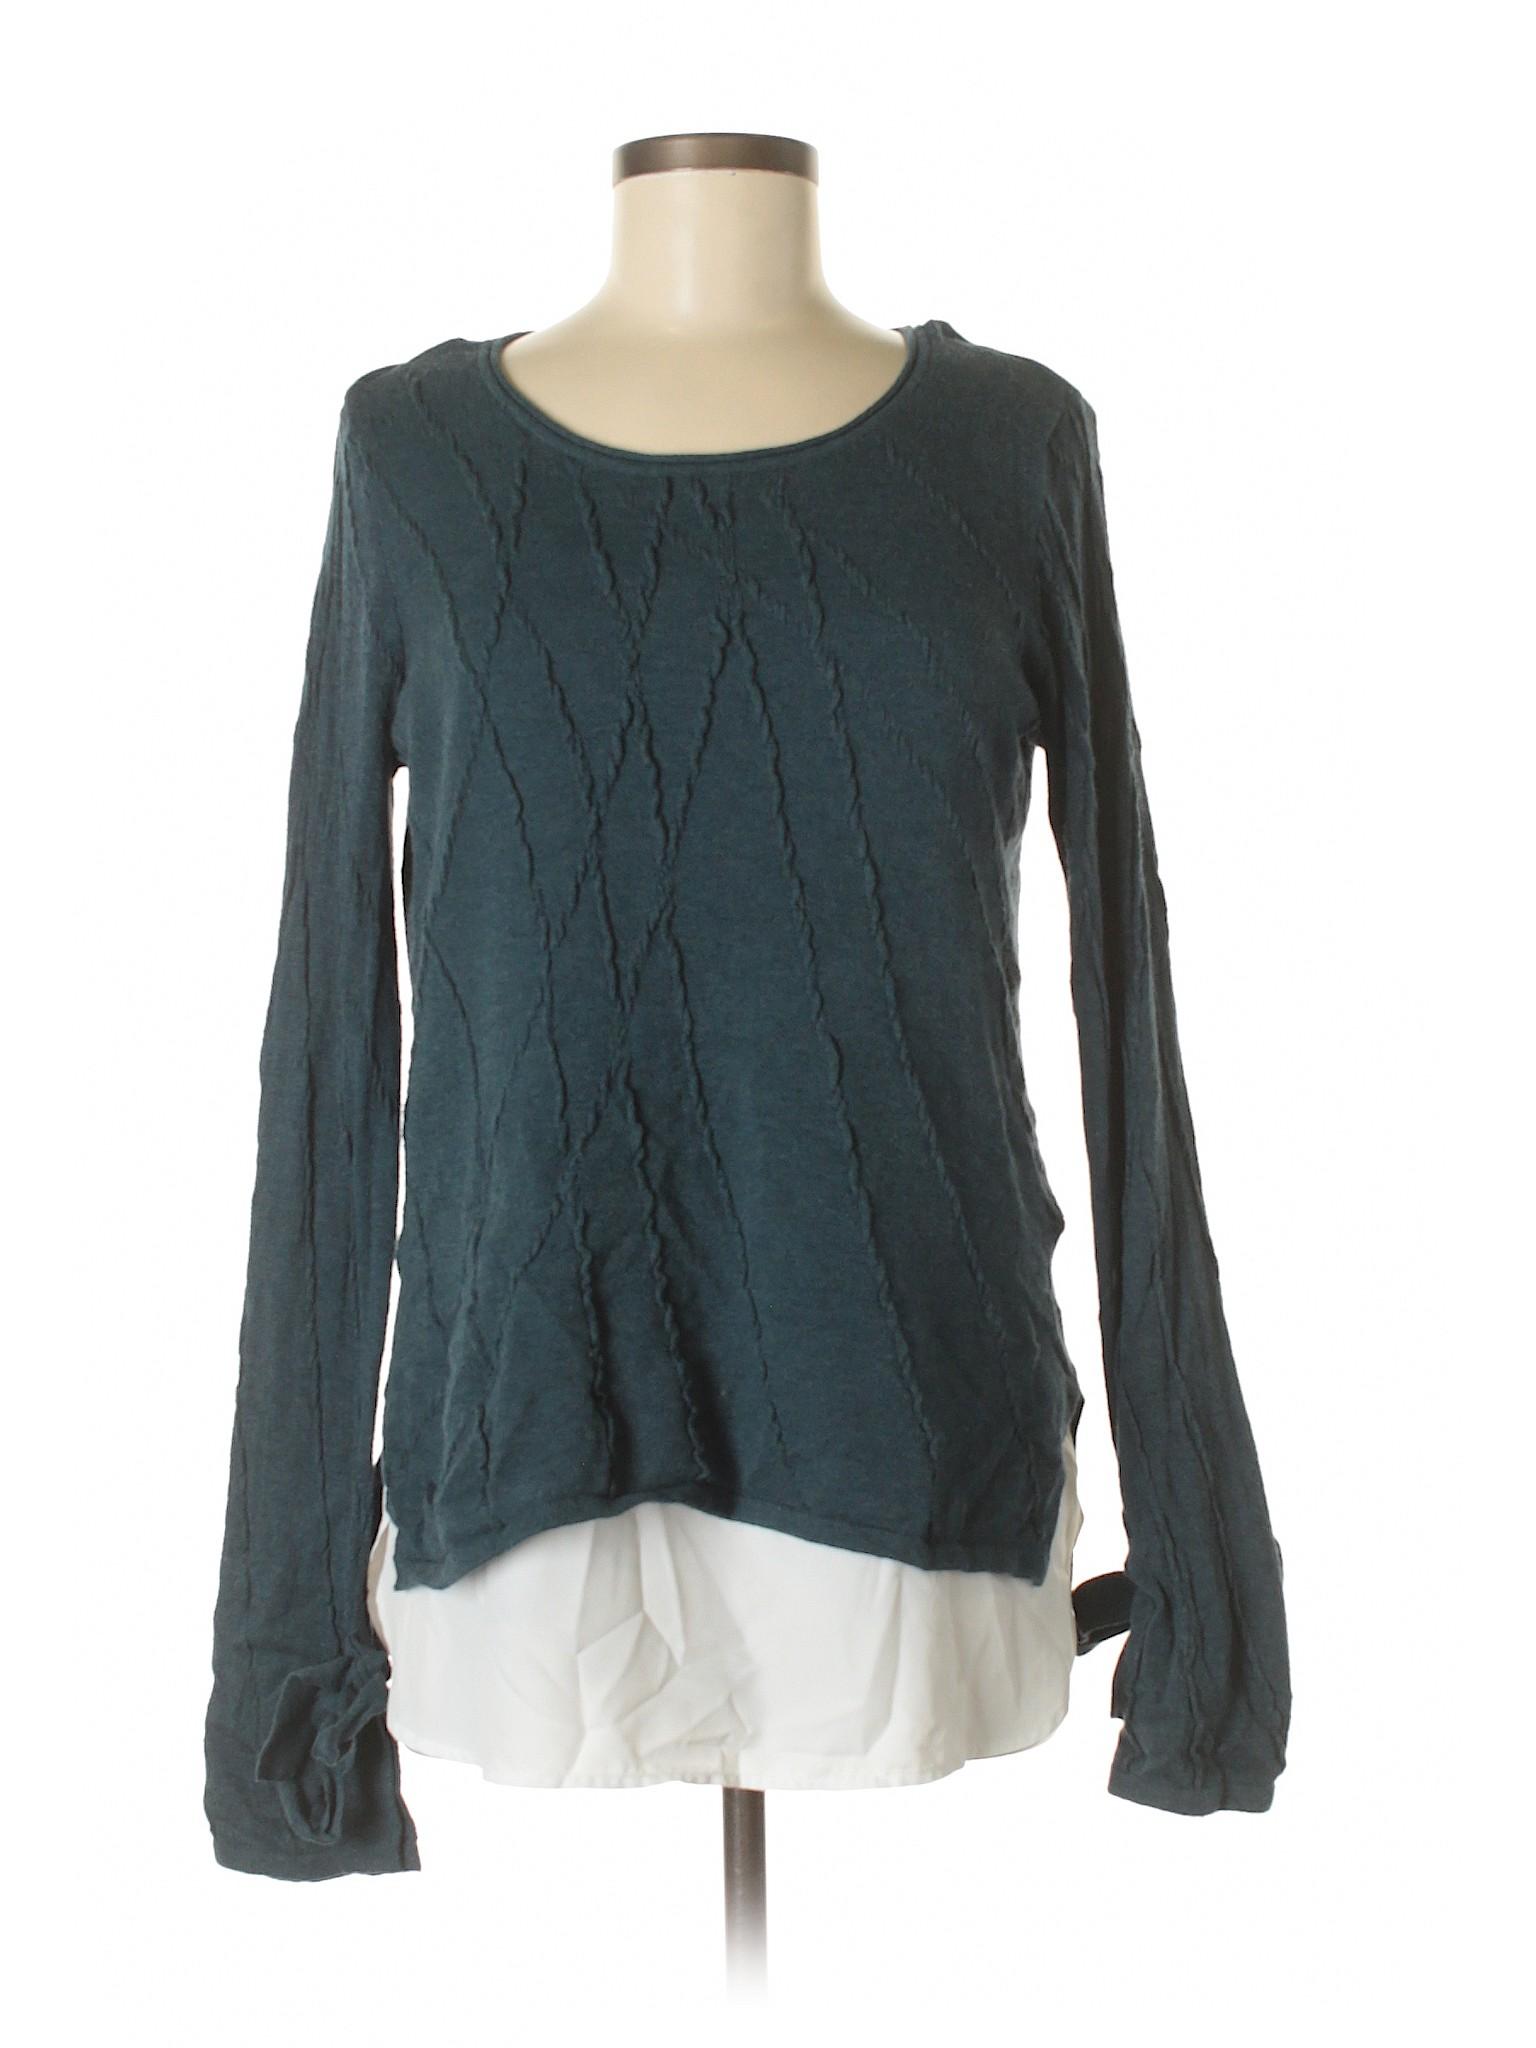 Wang Sweater Boutique winter Pullover Vera Simply Vera wwIFq6Y